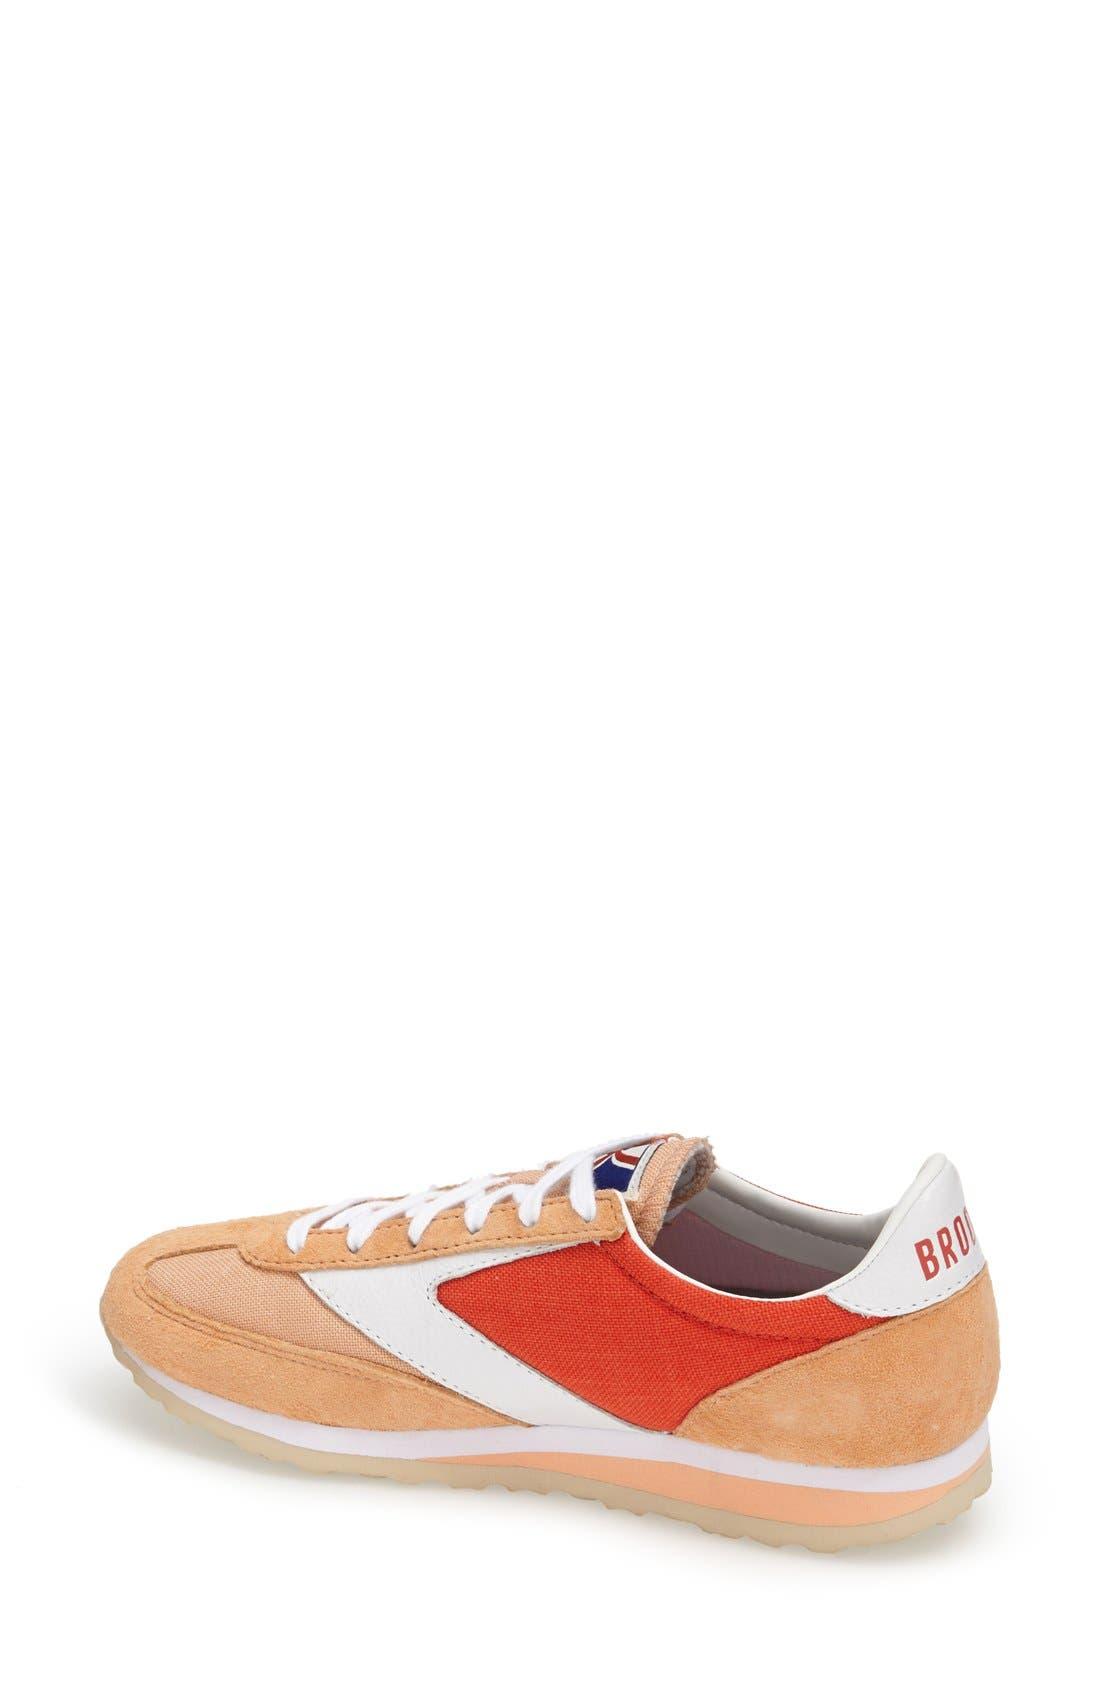 'Vanguard' Sneaker,                             Alternate thumbnail 184, color,